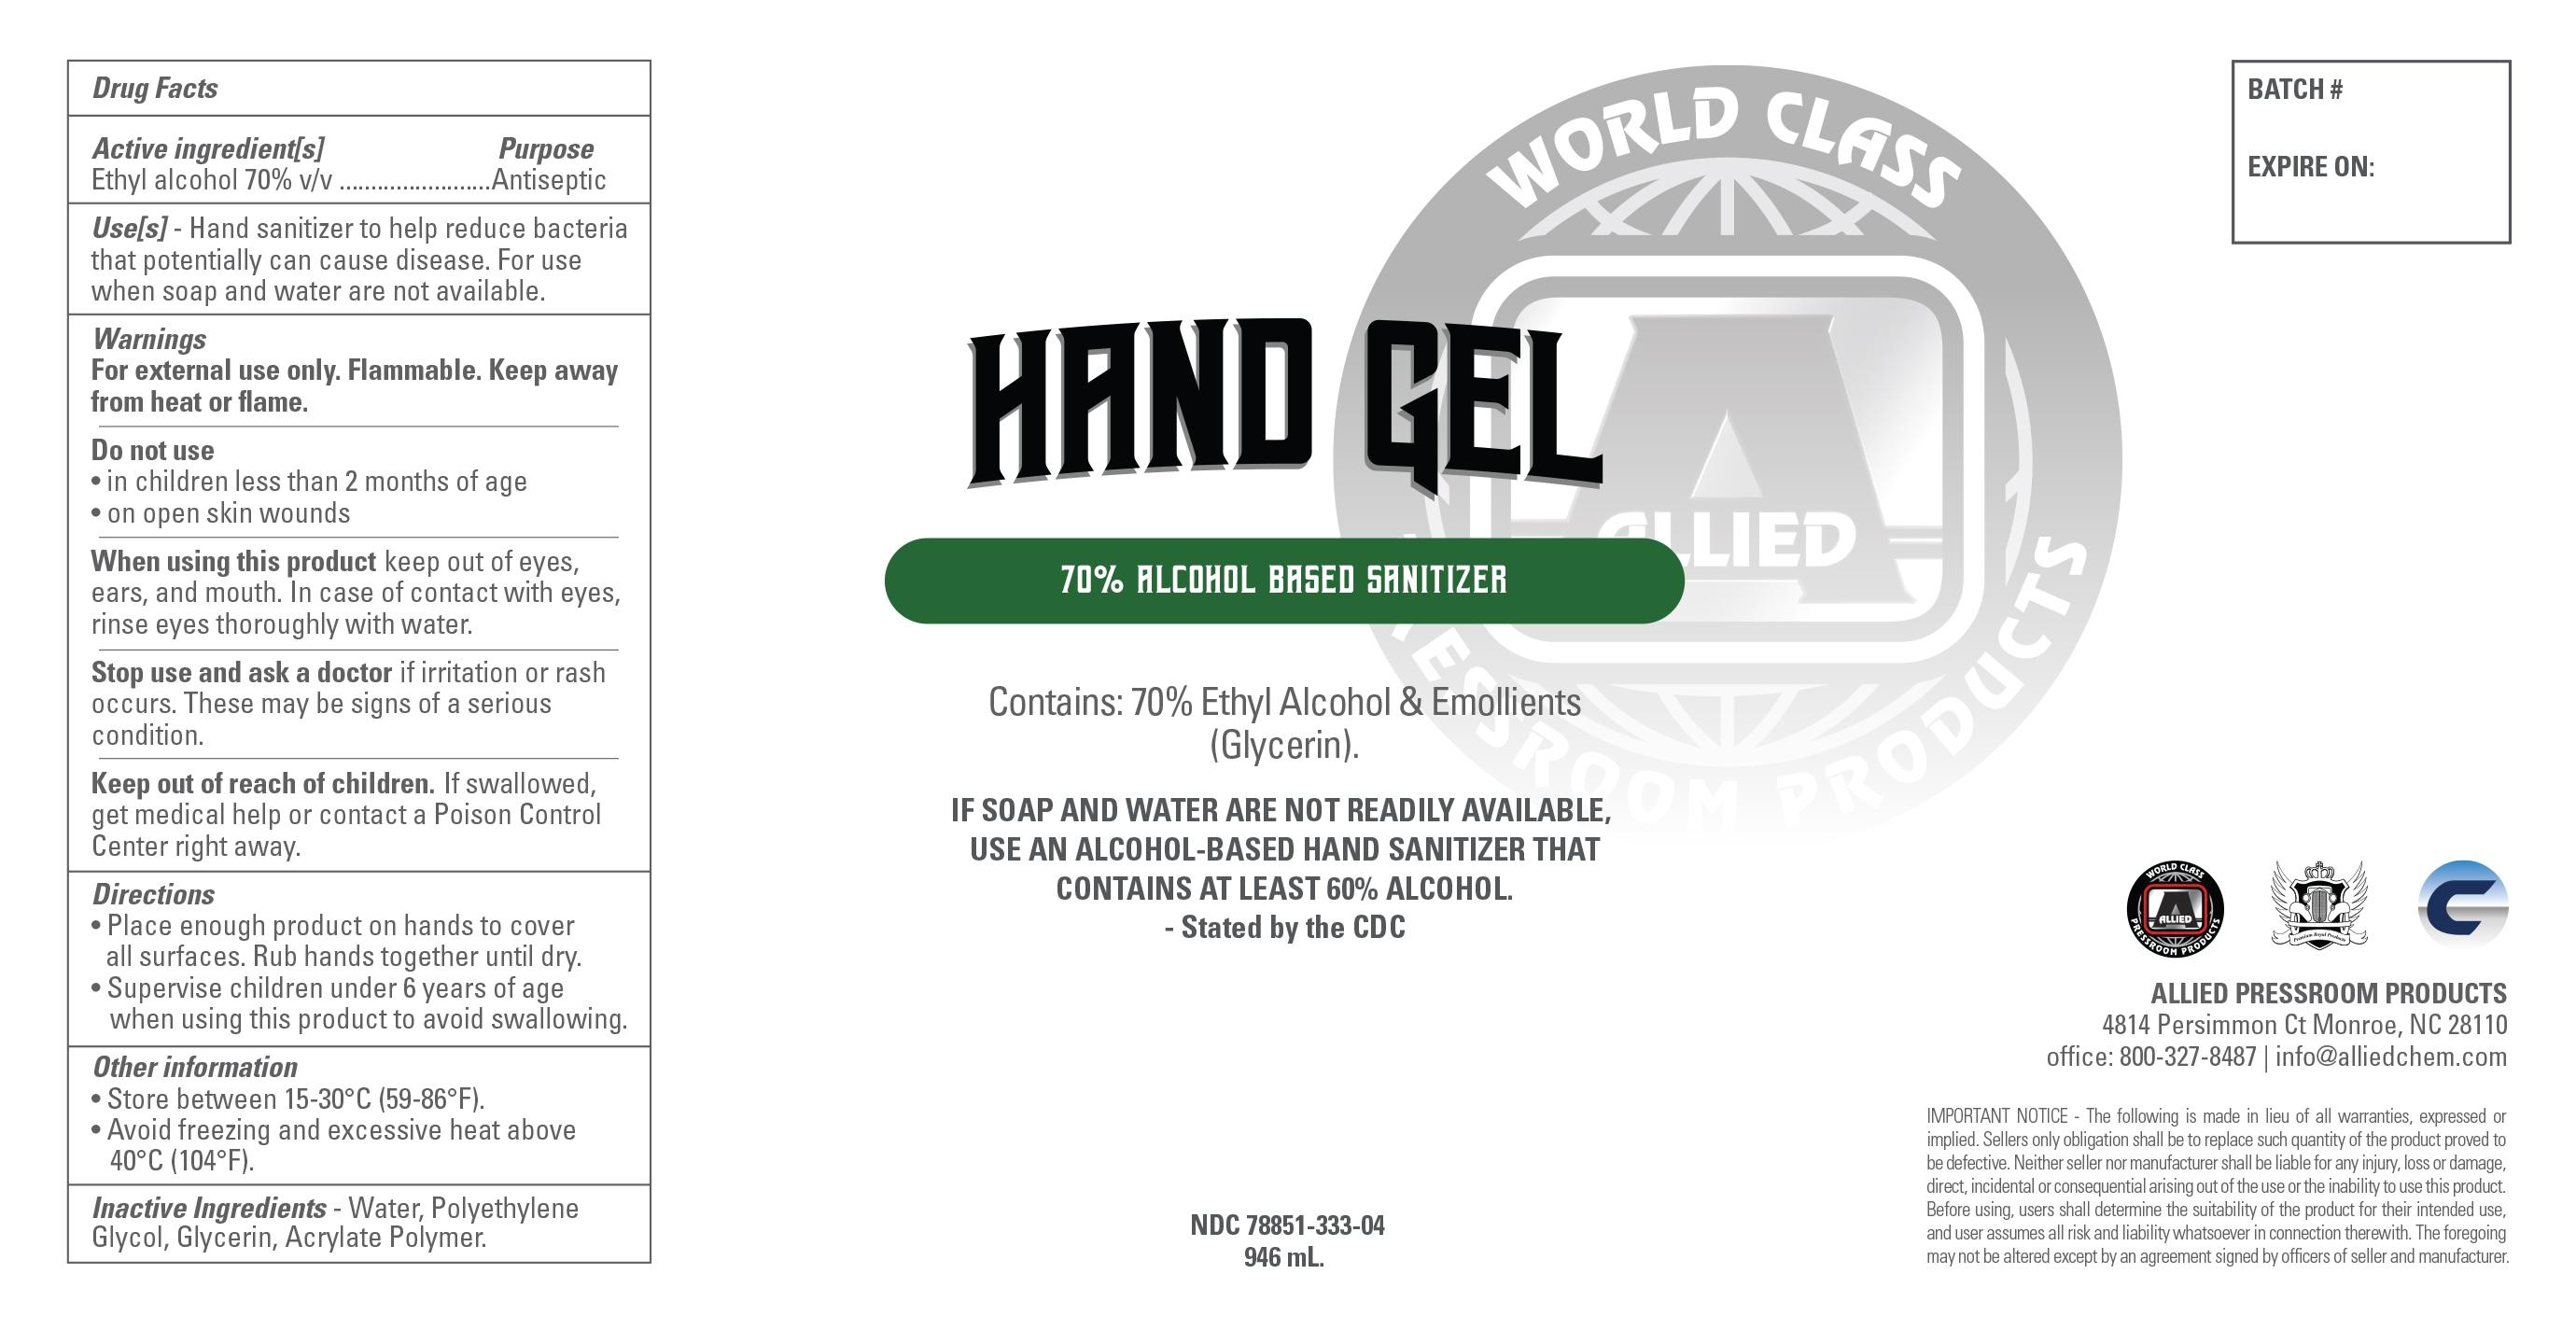 946 ml label